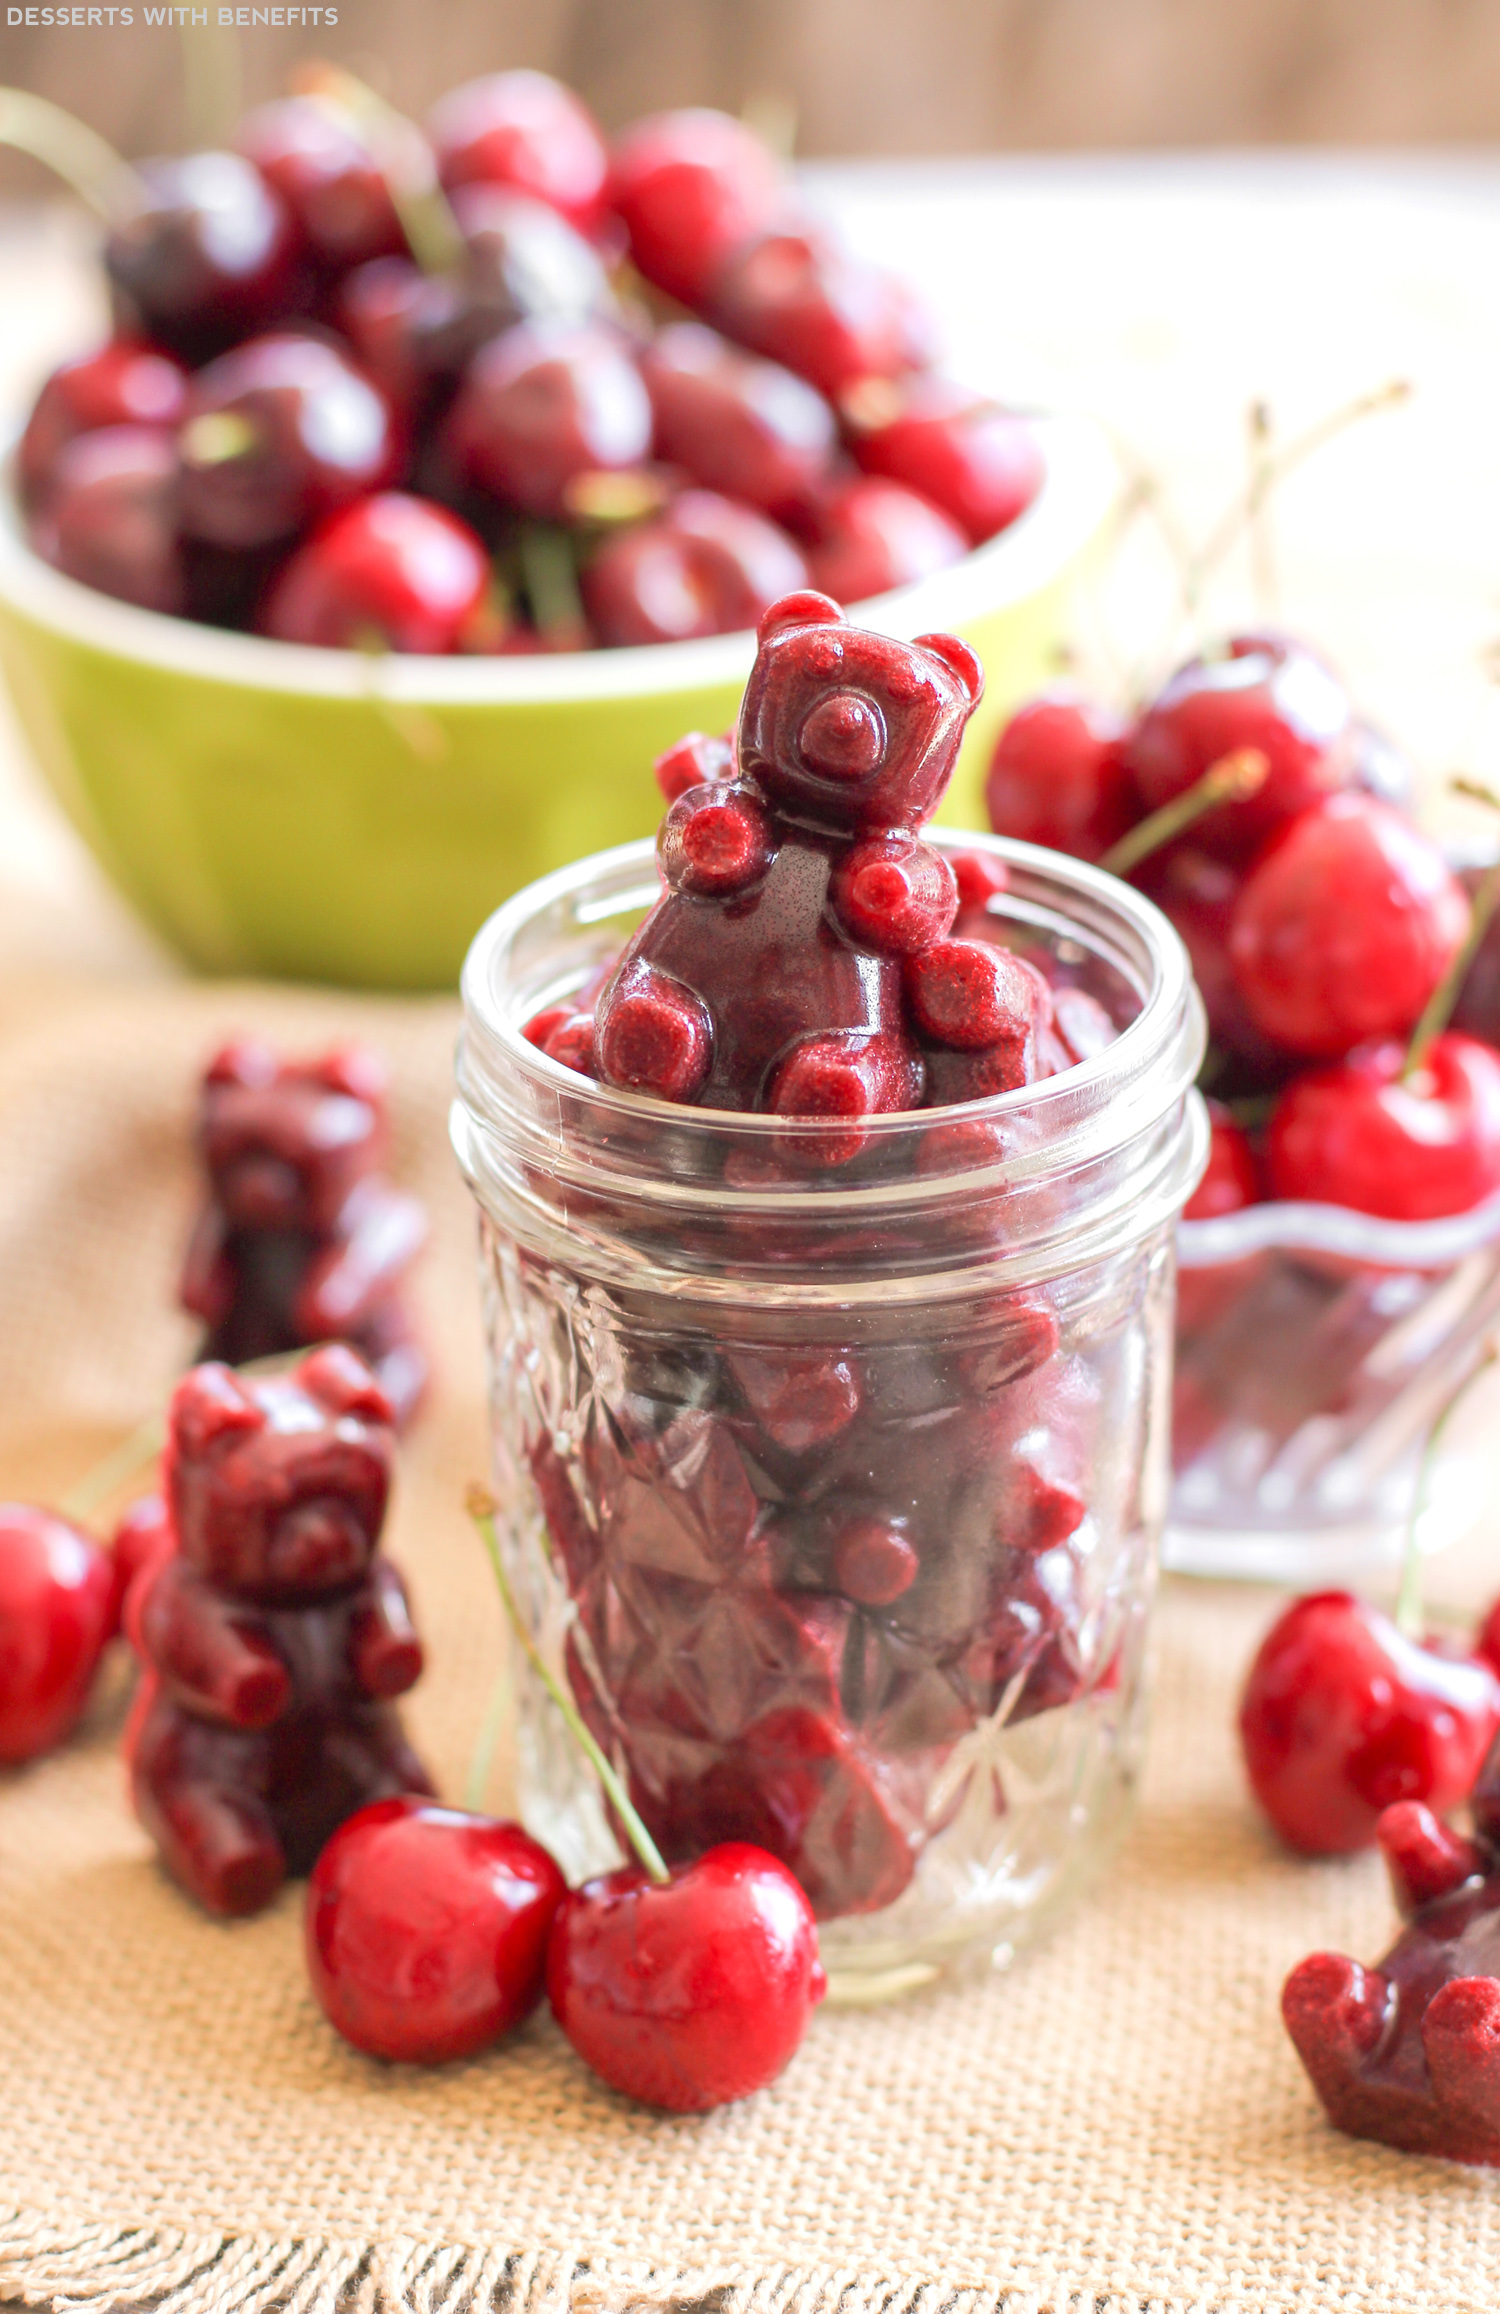 Healthy Very Cherry Fruit Snacks Refined Sugar Free Fat Gluten